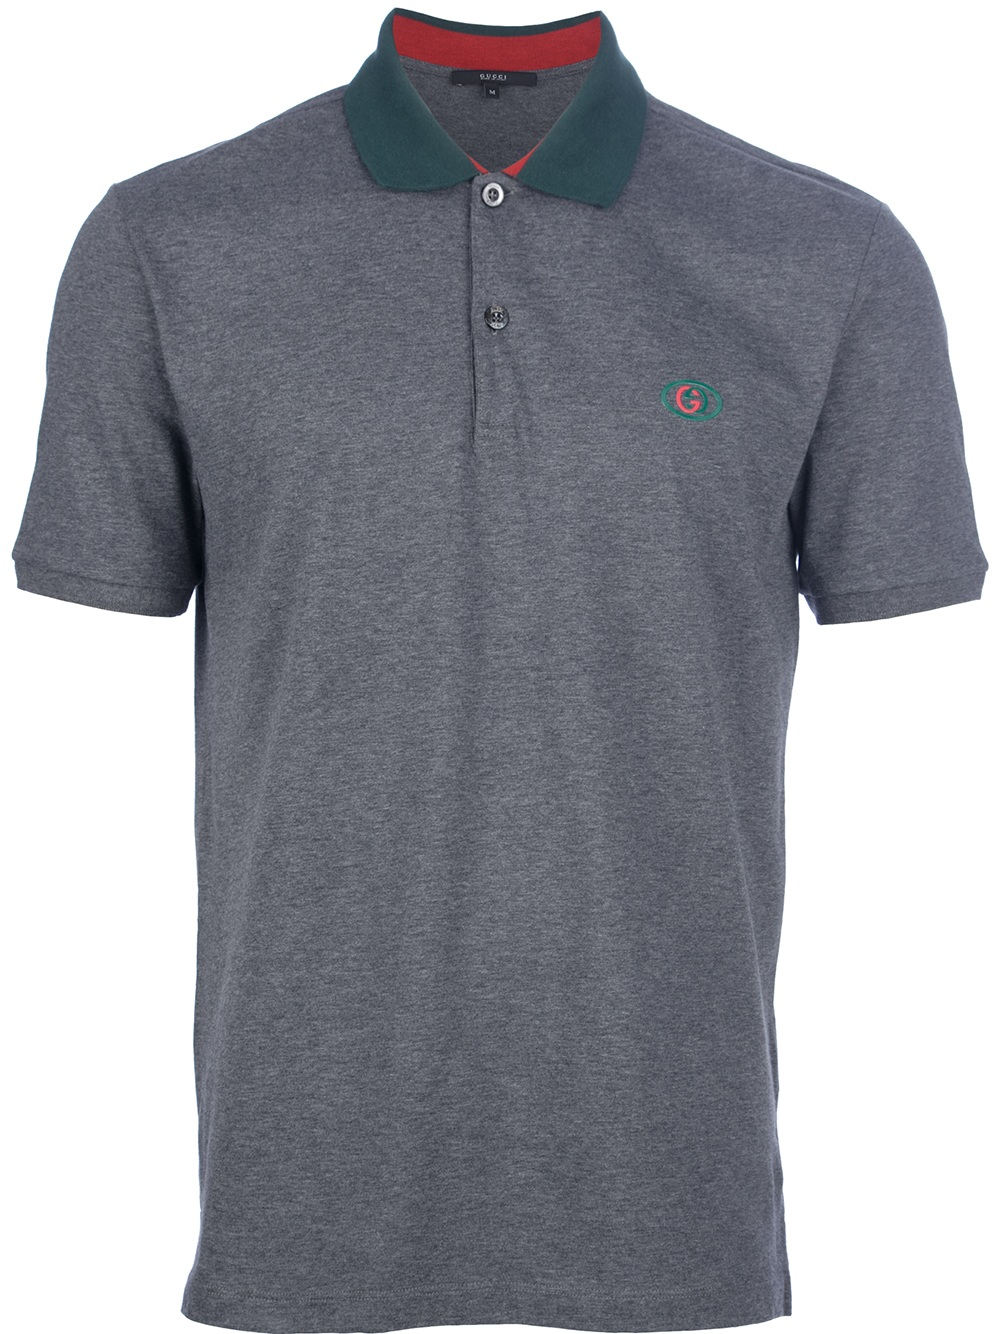 Gucci Polo Shirt In Gray For Men (grey)  14e137aa8c7